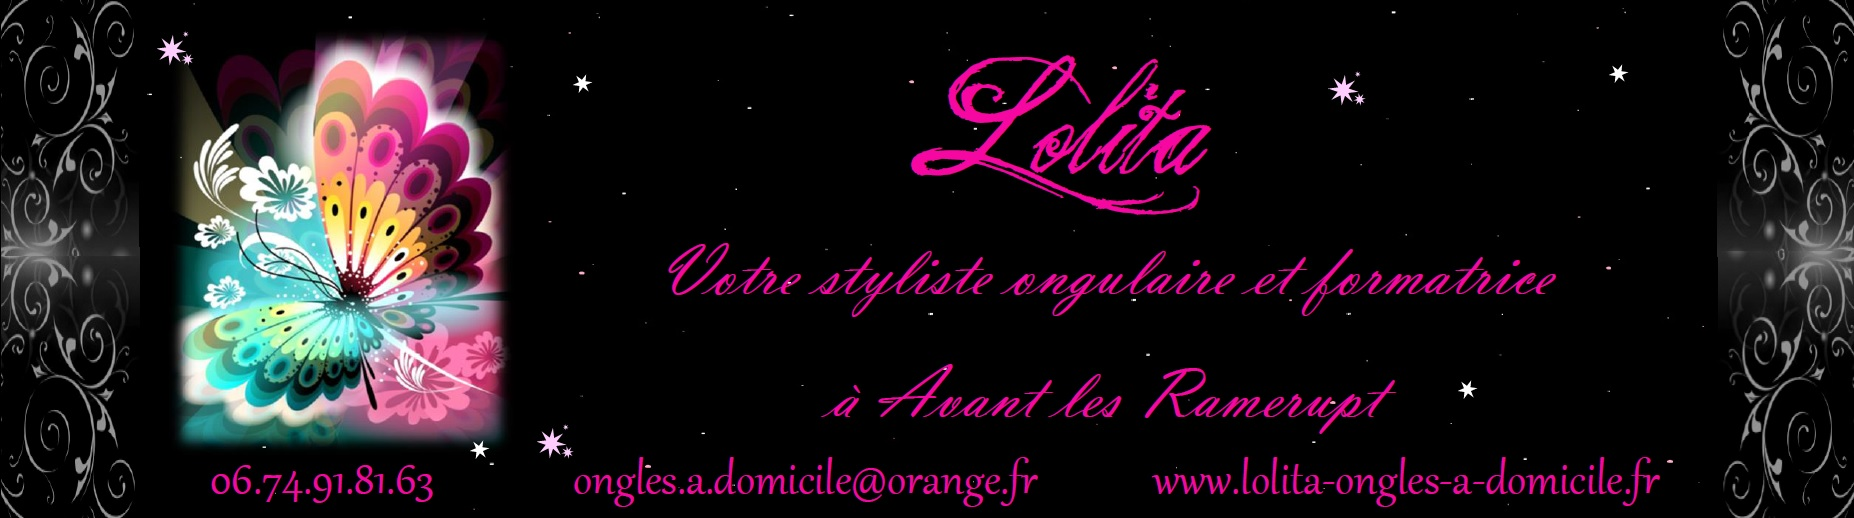 Bienvenue chez Lolita